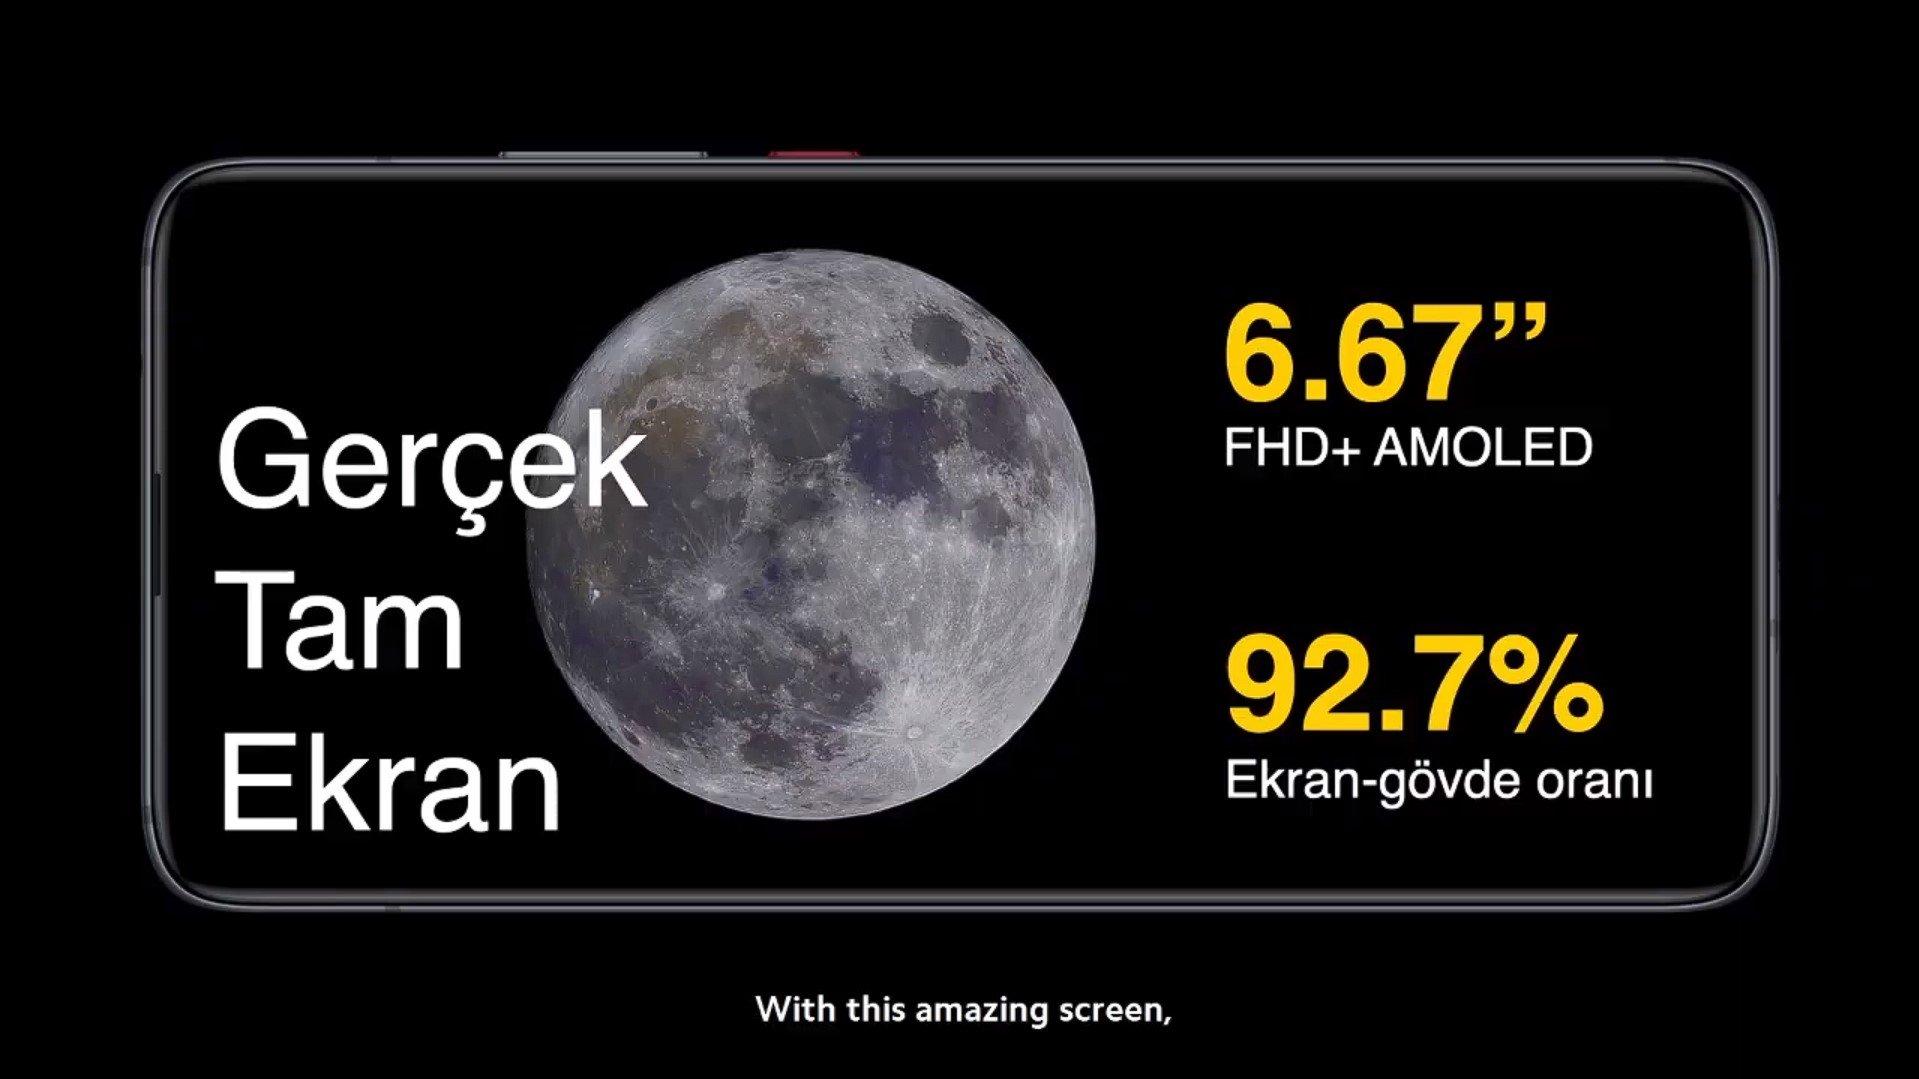 poco f2 pro turkiye fiyati belli oldu technopat mobil haber 4   Tekno Deha